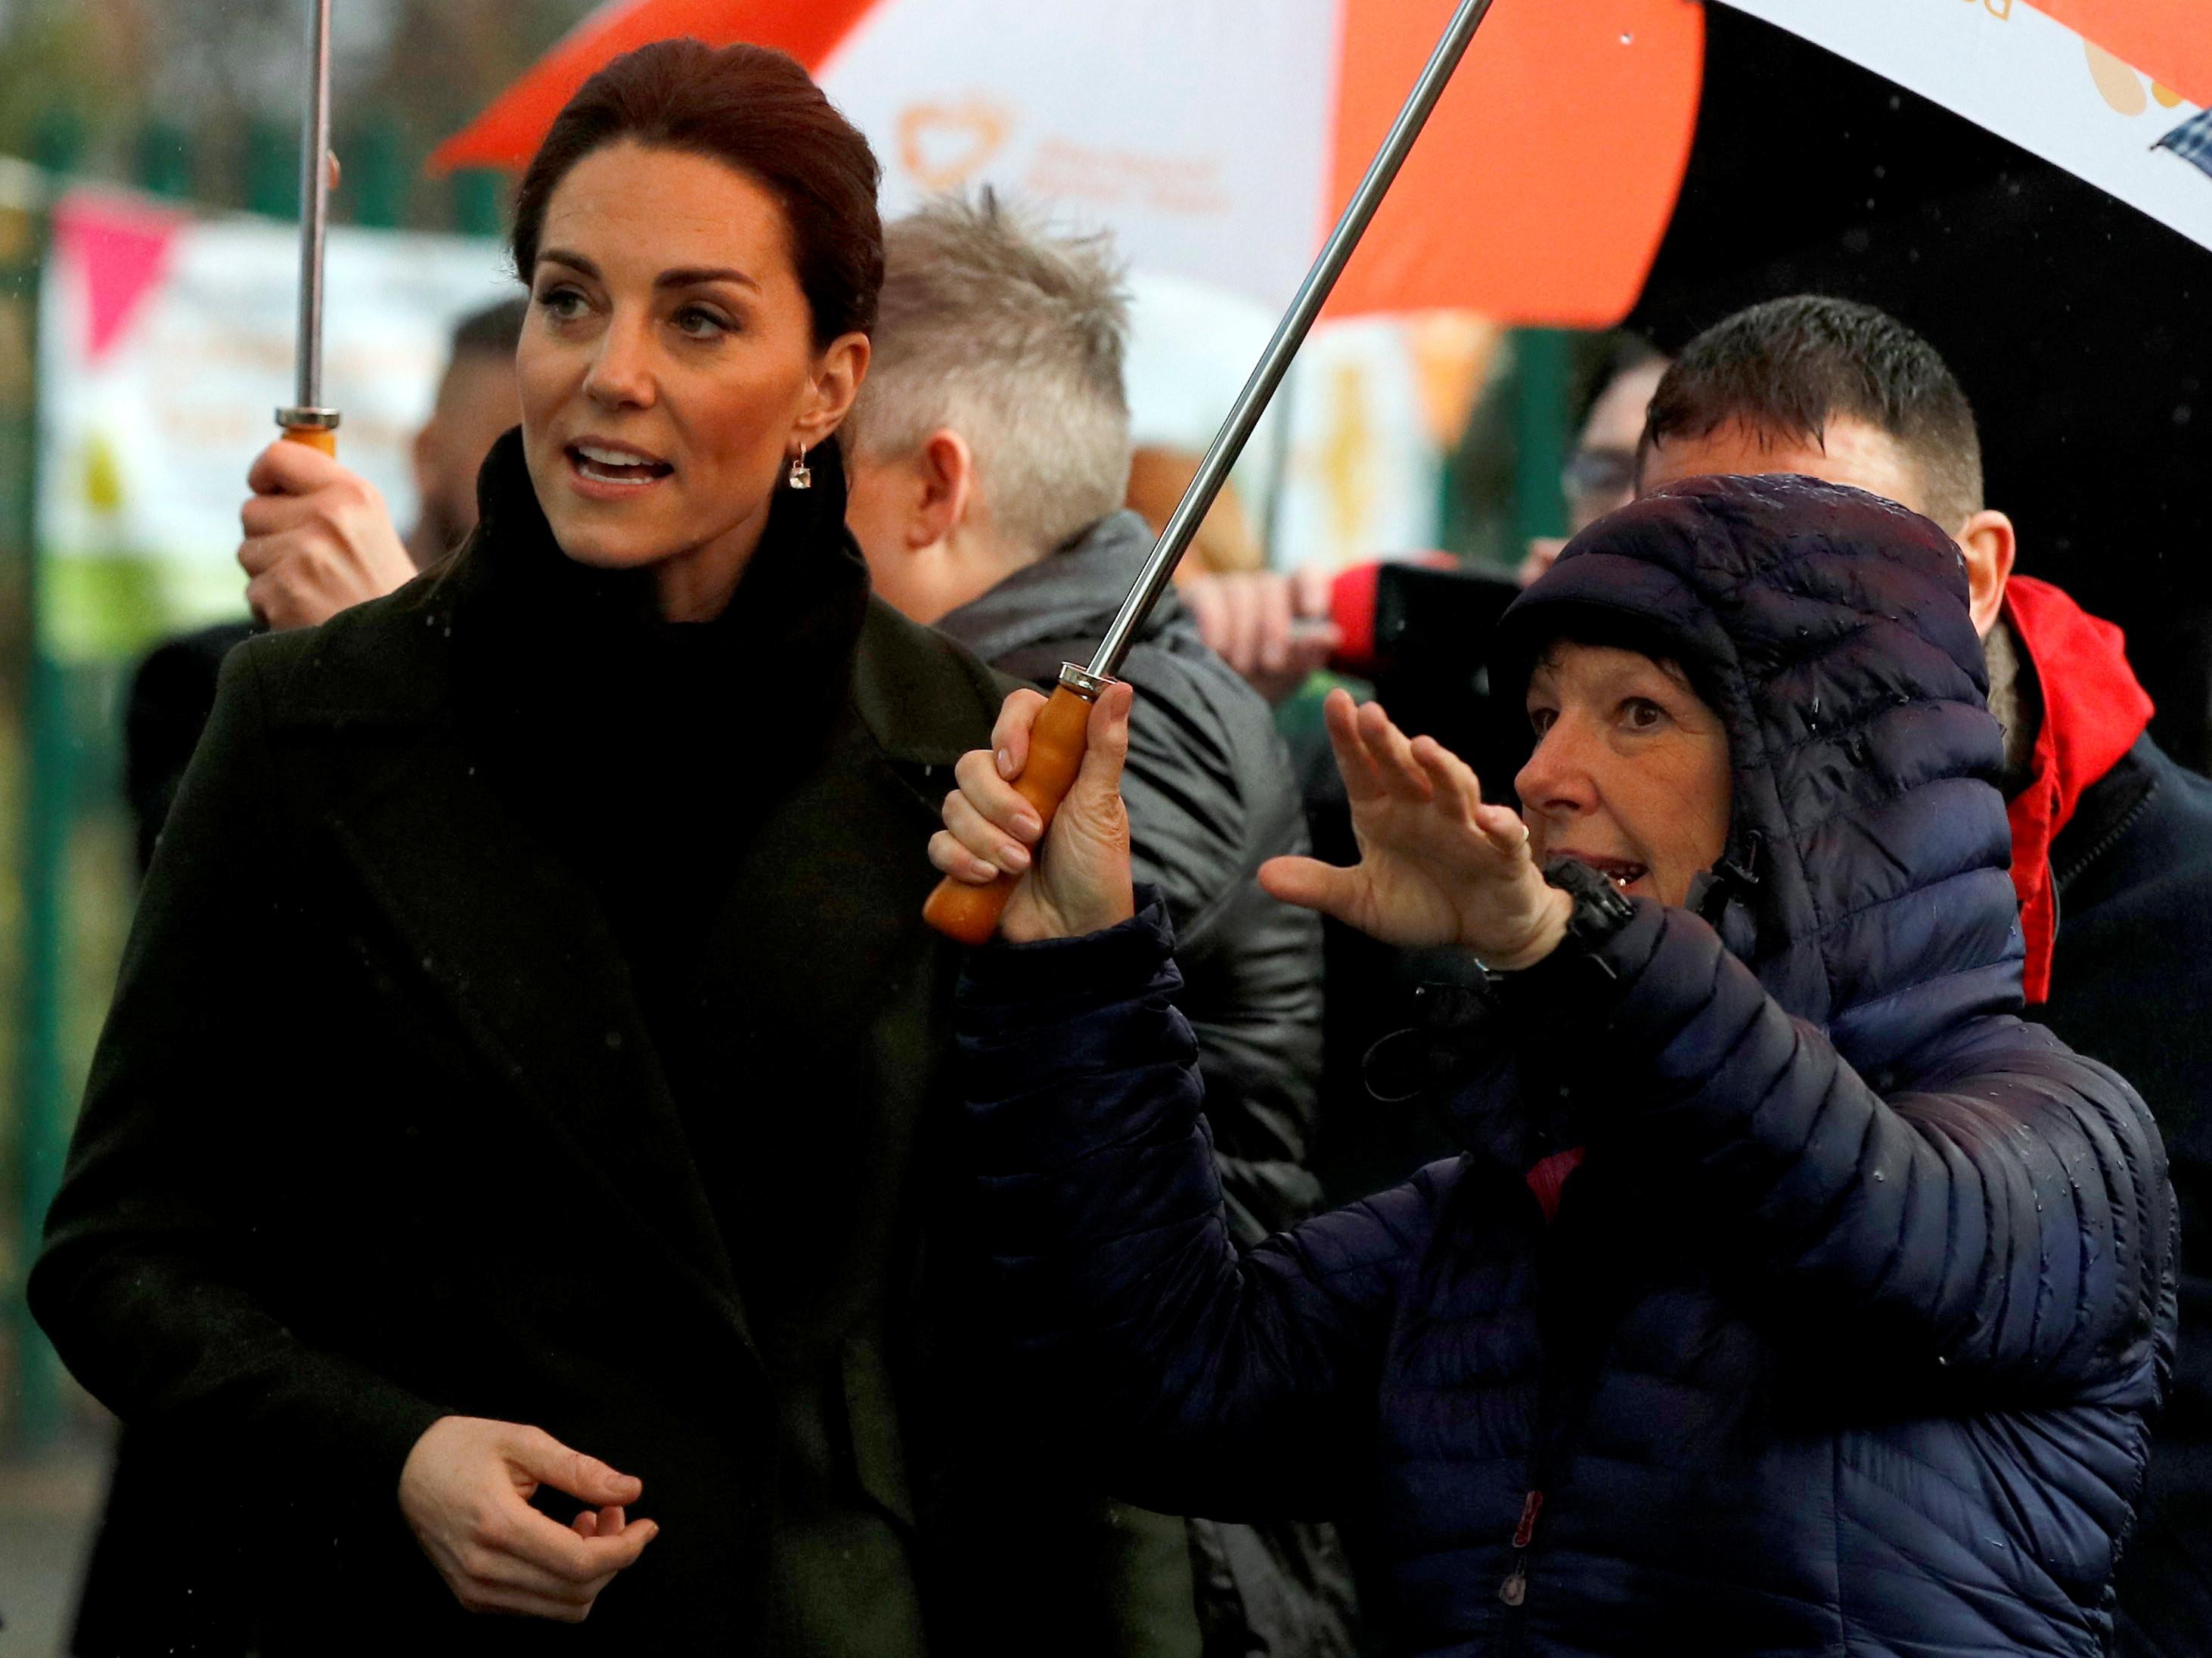 Nem a chuva roubou a elegância a Kate Middleton